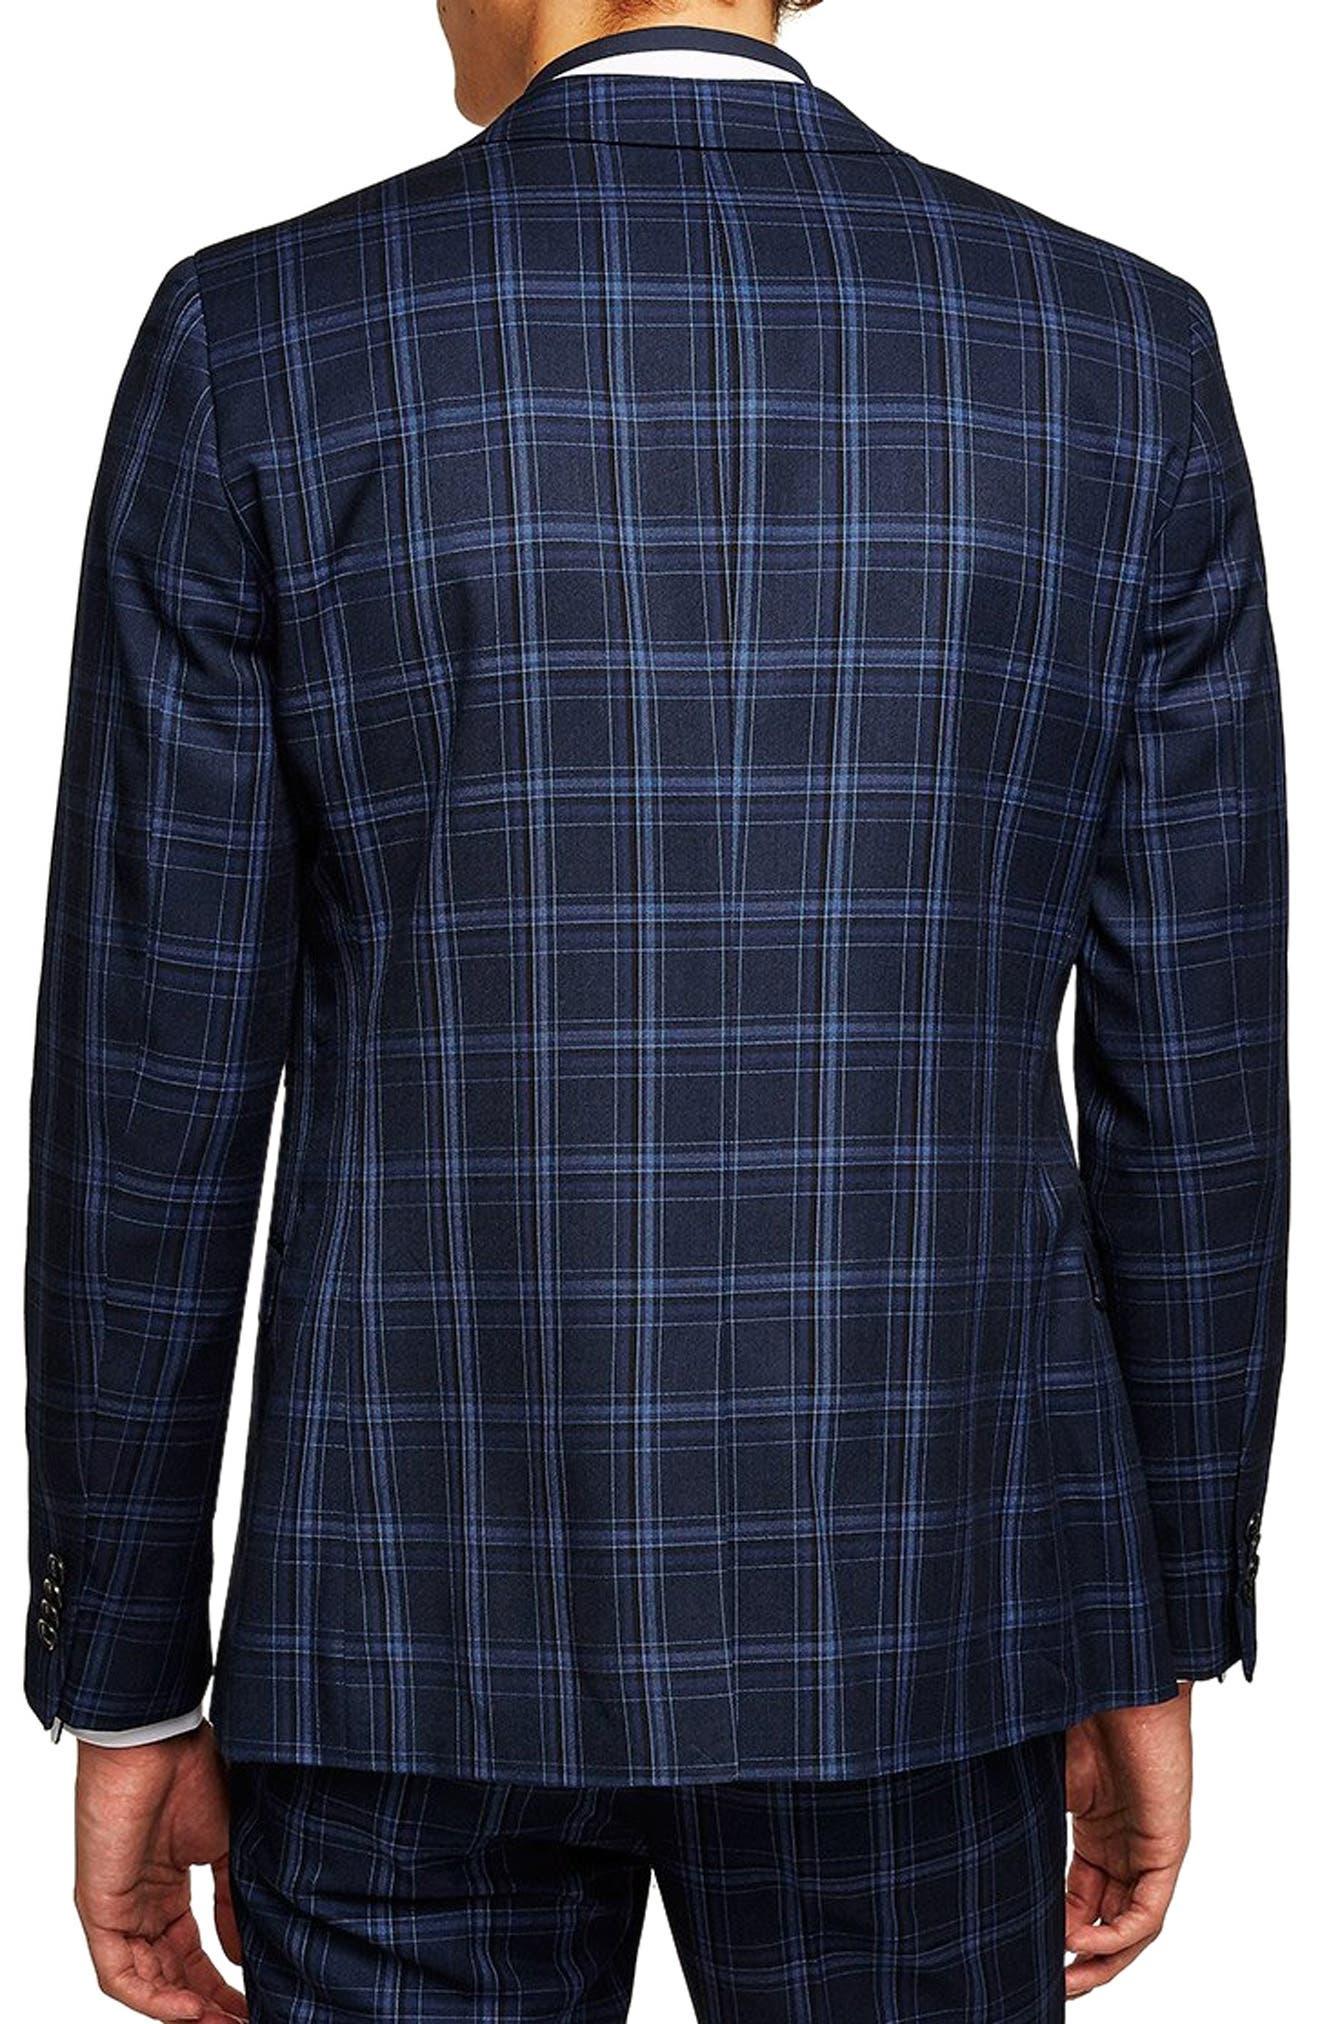 TOPMAN, Skinny Fit Check Suit Jacket, Alternate thumbnail 2, color, 400